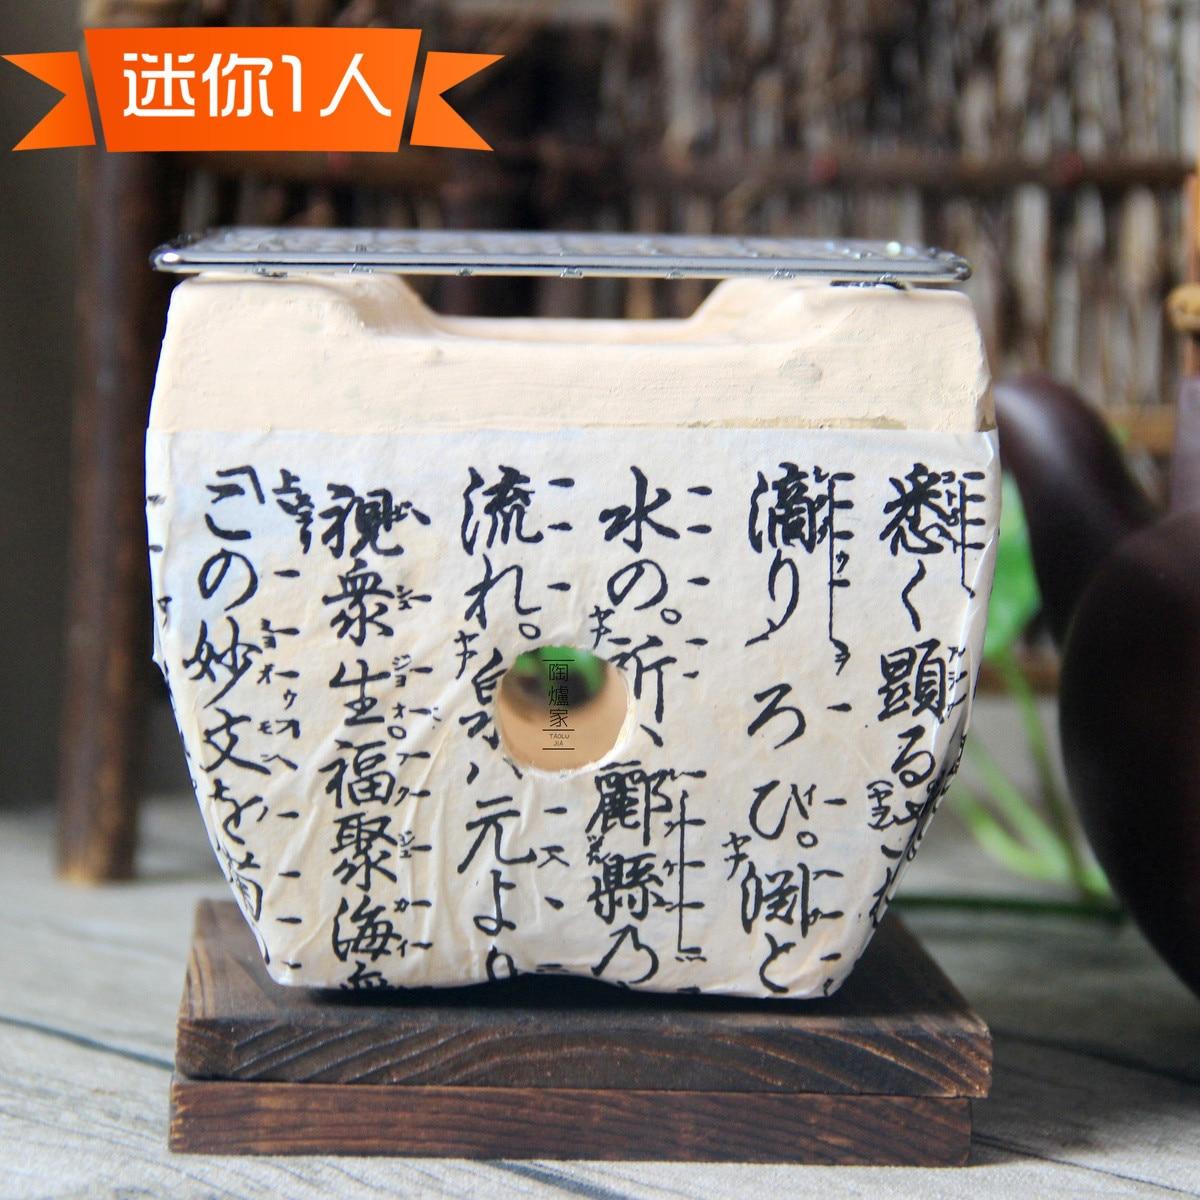 Cocina de arcilla, cocina de estilo japonés, barbacoa, comida a mano rápida, carne asada, horno, parrilla de carbón, barbacoa de personajes chinos